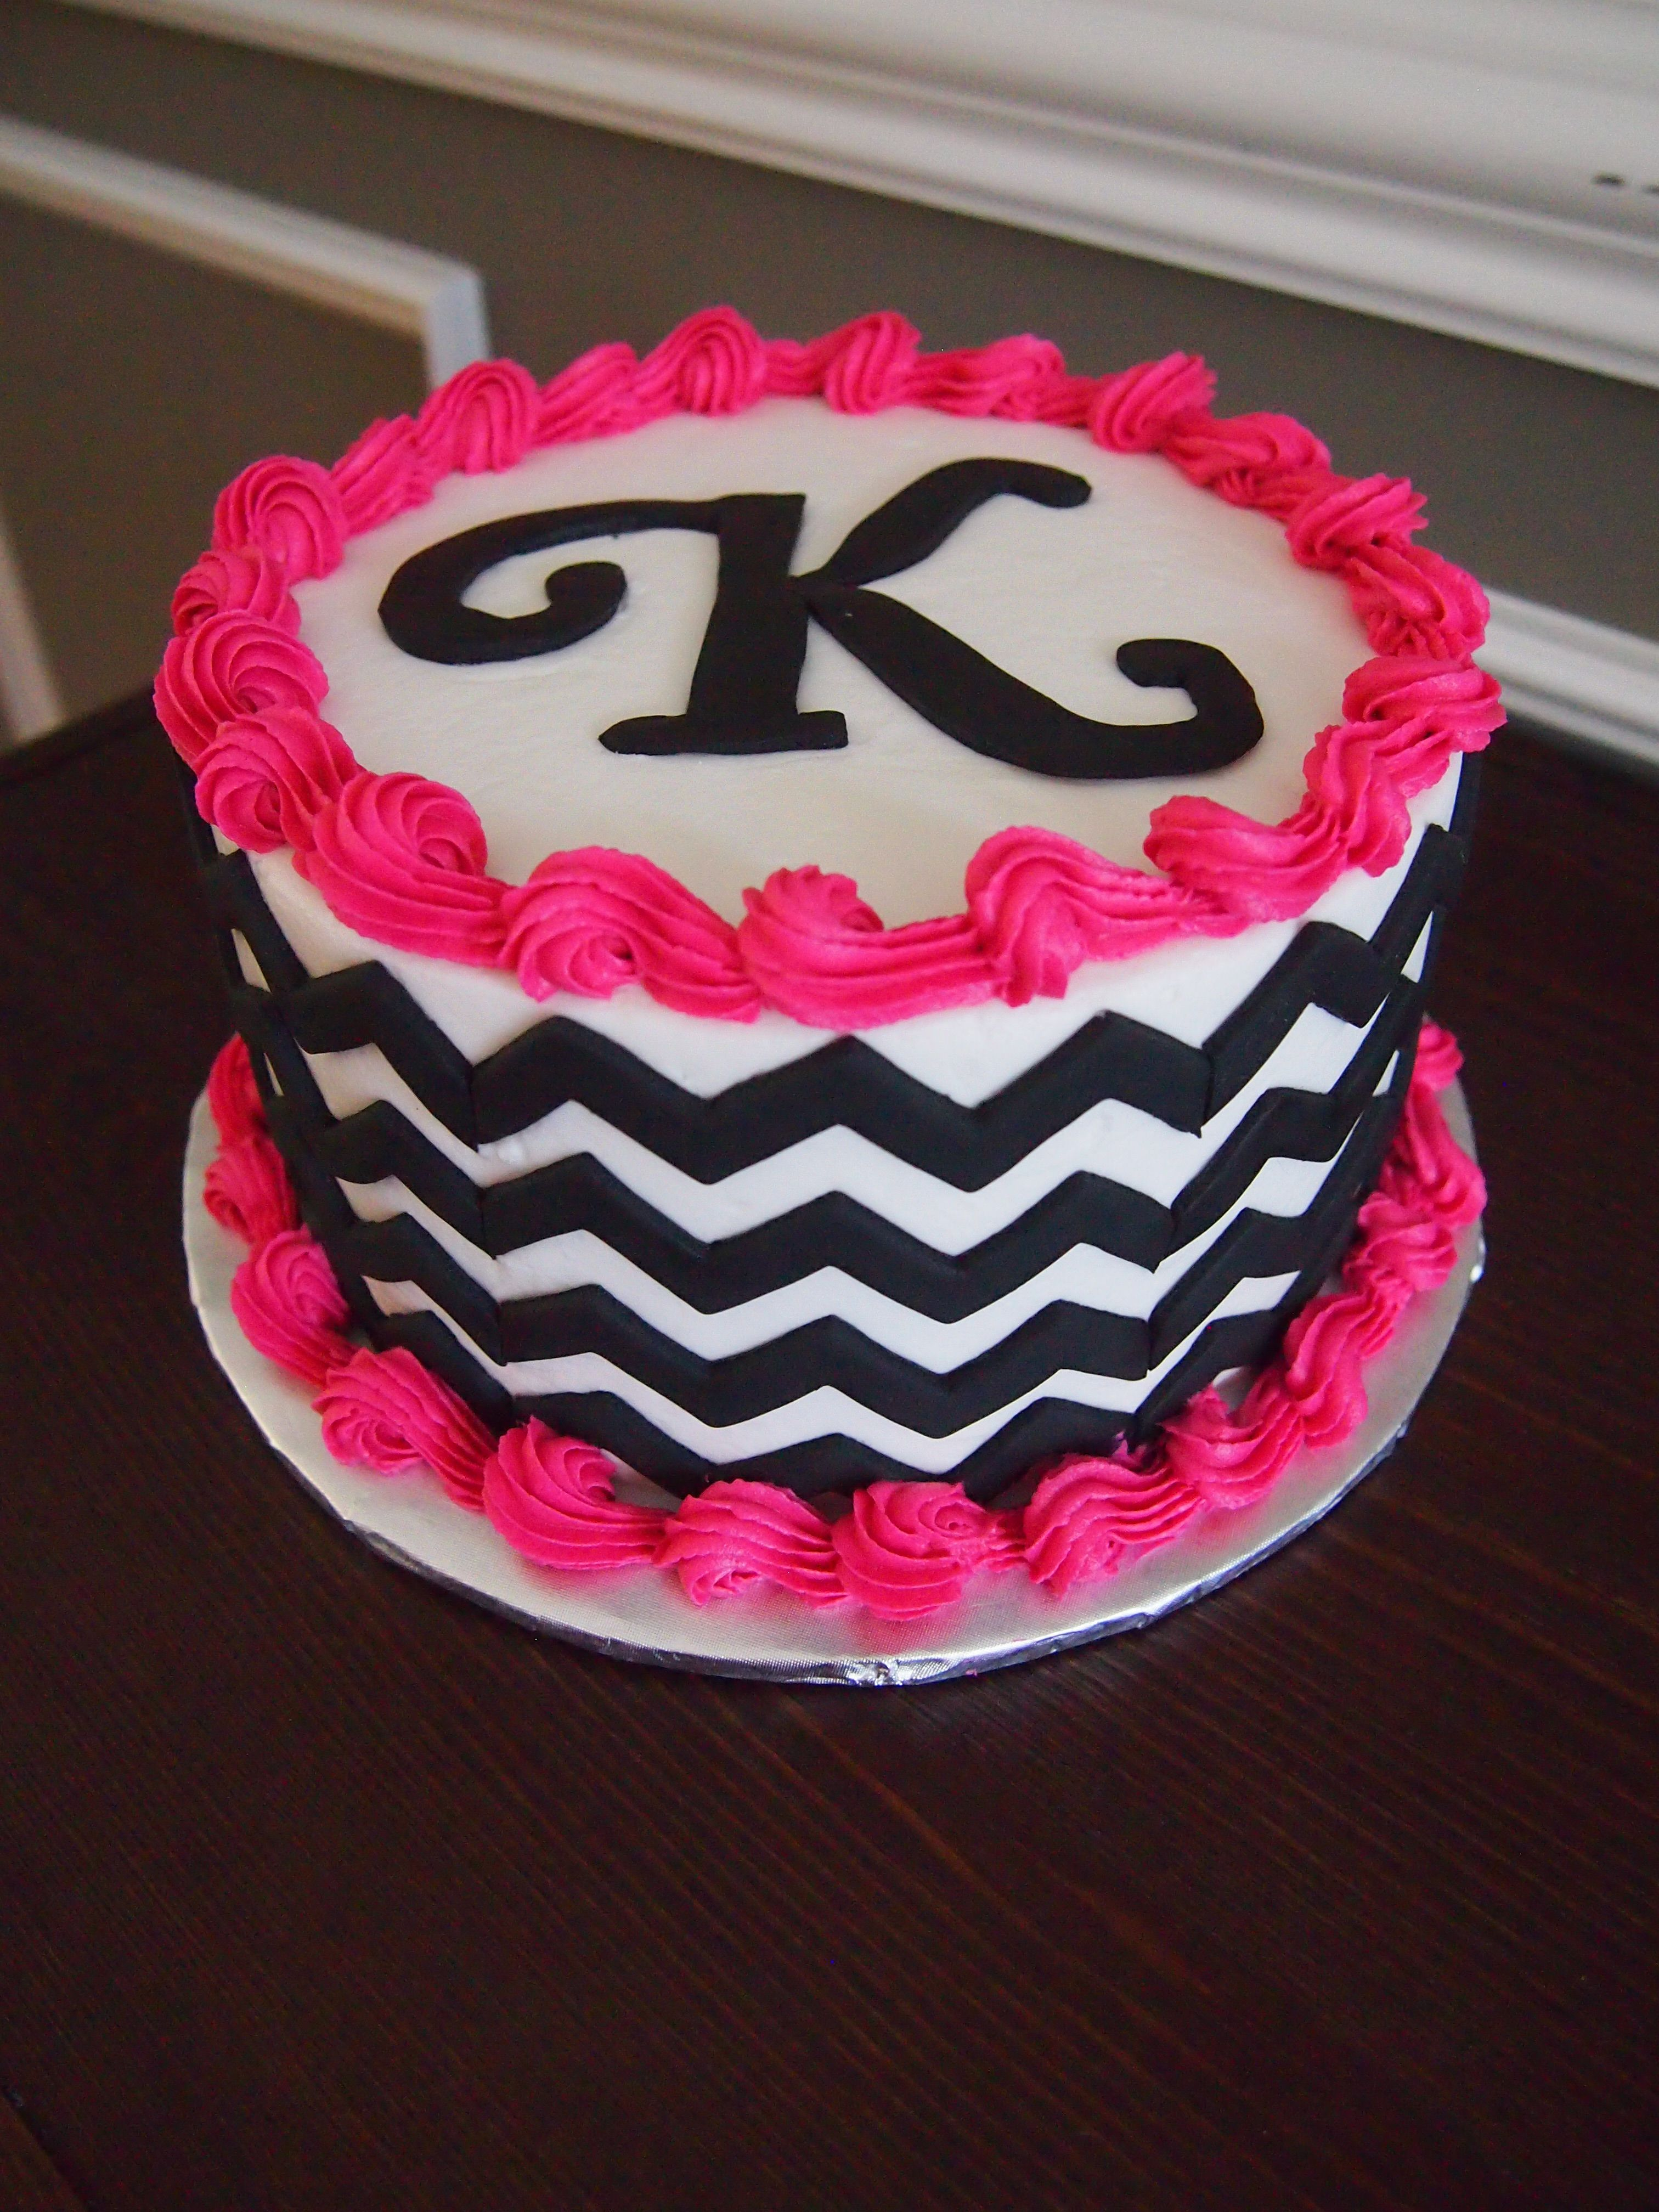 13th Birthday Cake Ideas For Girls 782 Birthday Cake Ideas